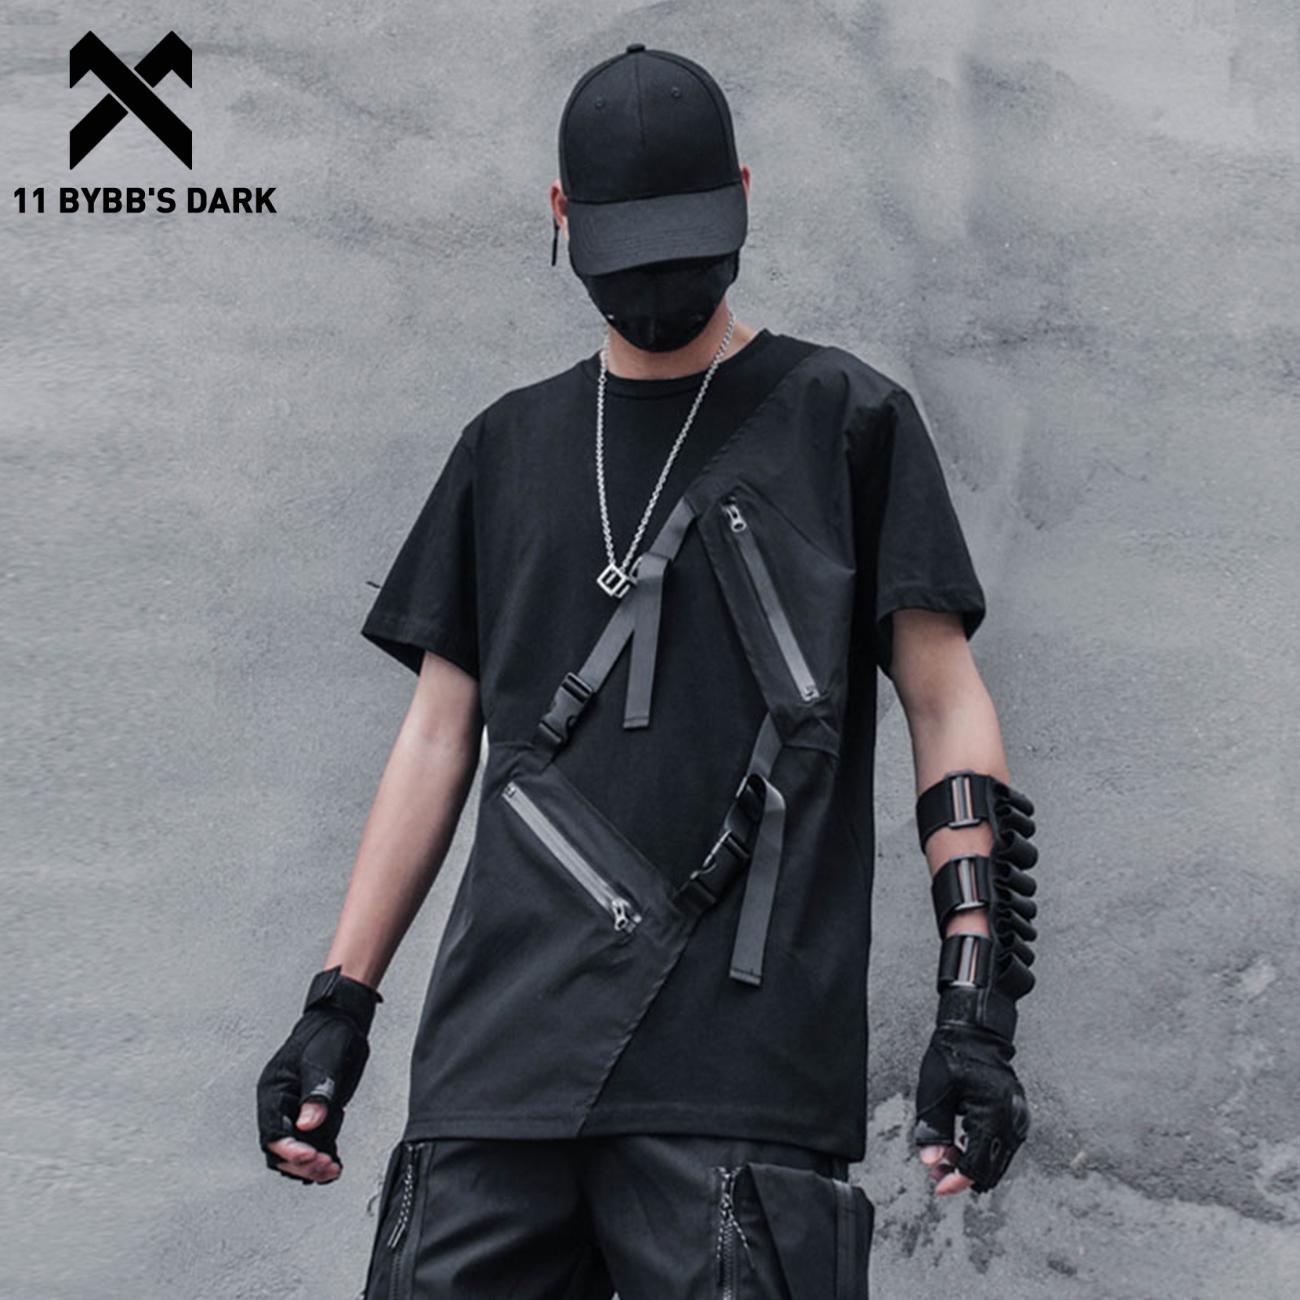 11 BYBB'S DARK 2021 شريط المرقعة الهيب هوب تي شيرت الرجال وظيفية Harajuku بلايز القطن فضفاضة قصيرة الأكمام قمصان الشارع الشهير